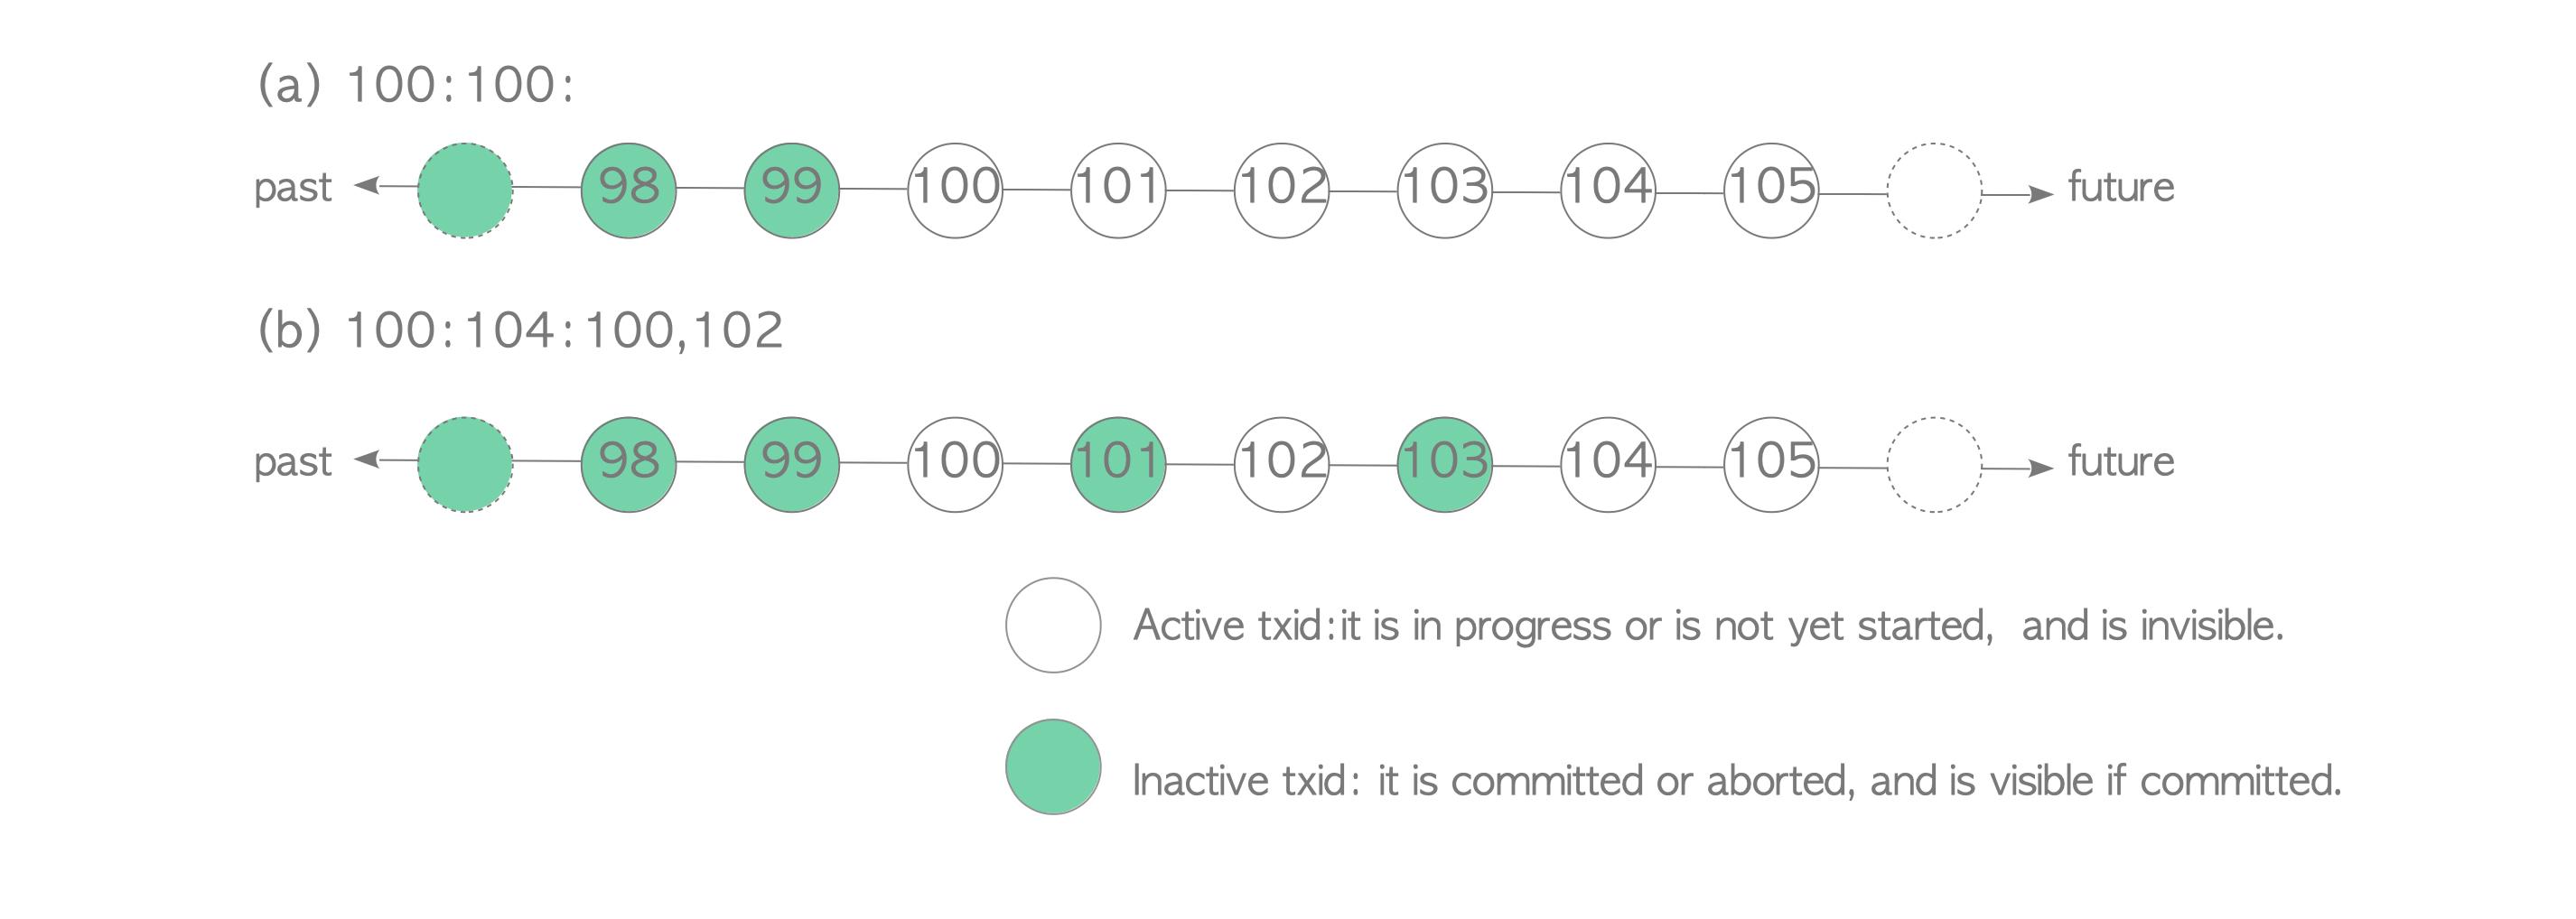 Fig. 5.8. Examples of transaction snapshot representation.